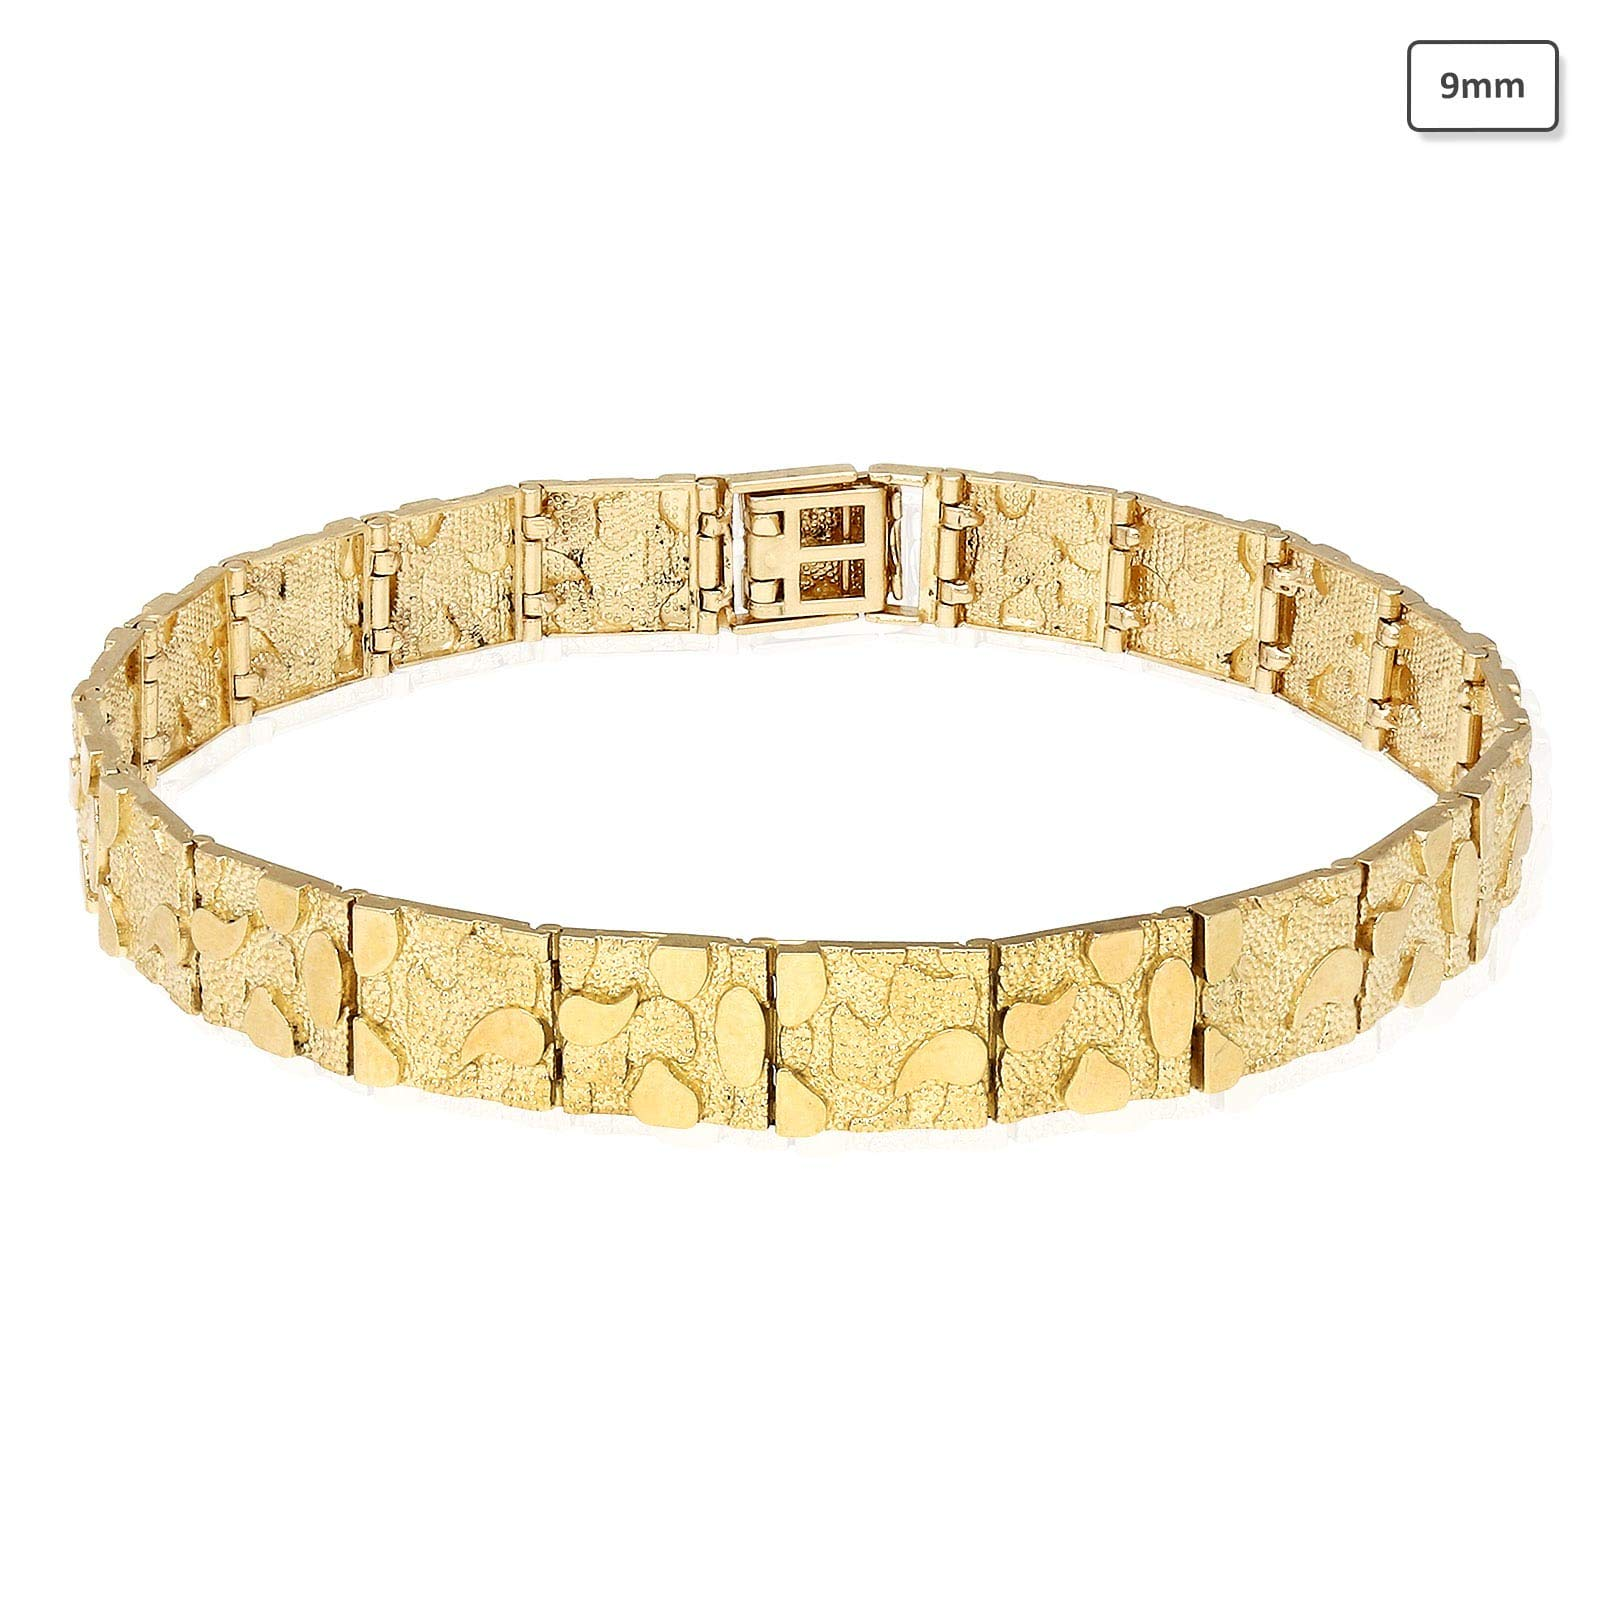 Solid 10K Yellow Gold 3.5mm-9mm Nugget Diamond-Cut Bracelet 8.25'', 9